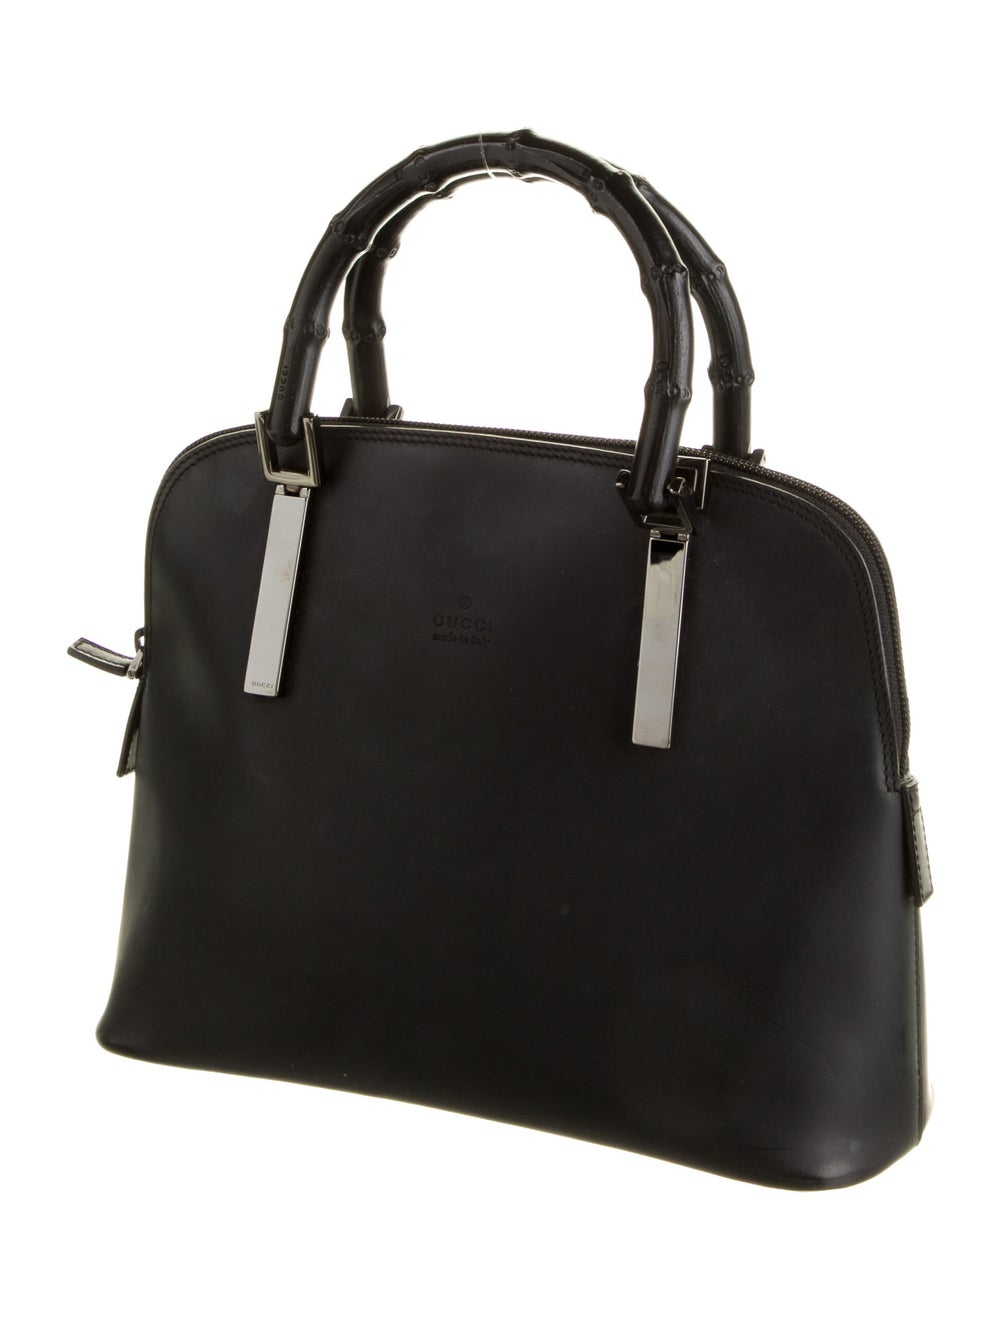 Gucci Bamboo Top Handle Bag Black - image 3